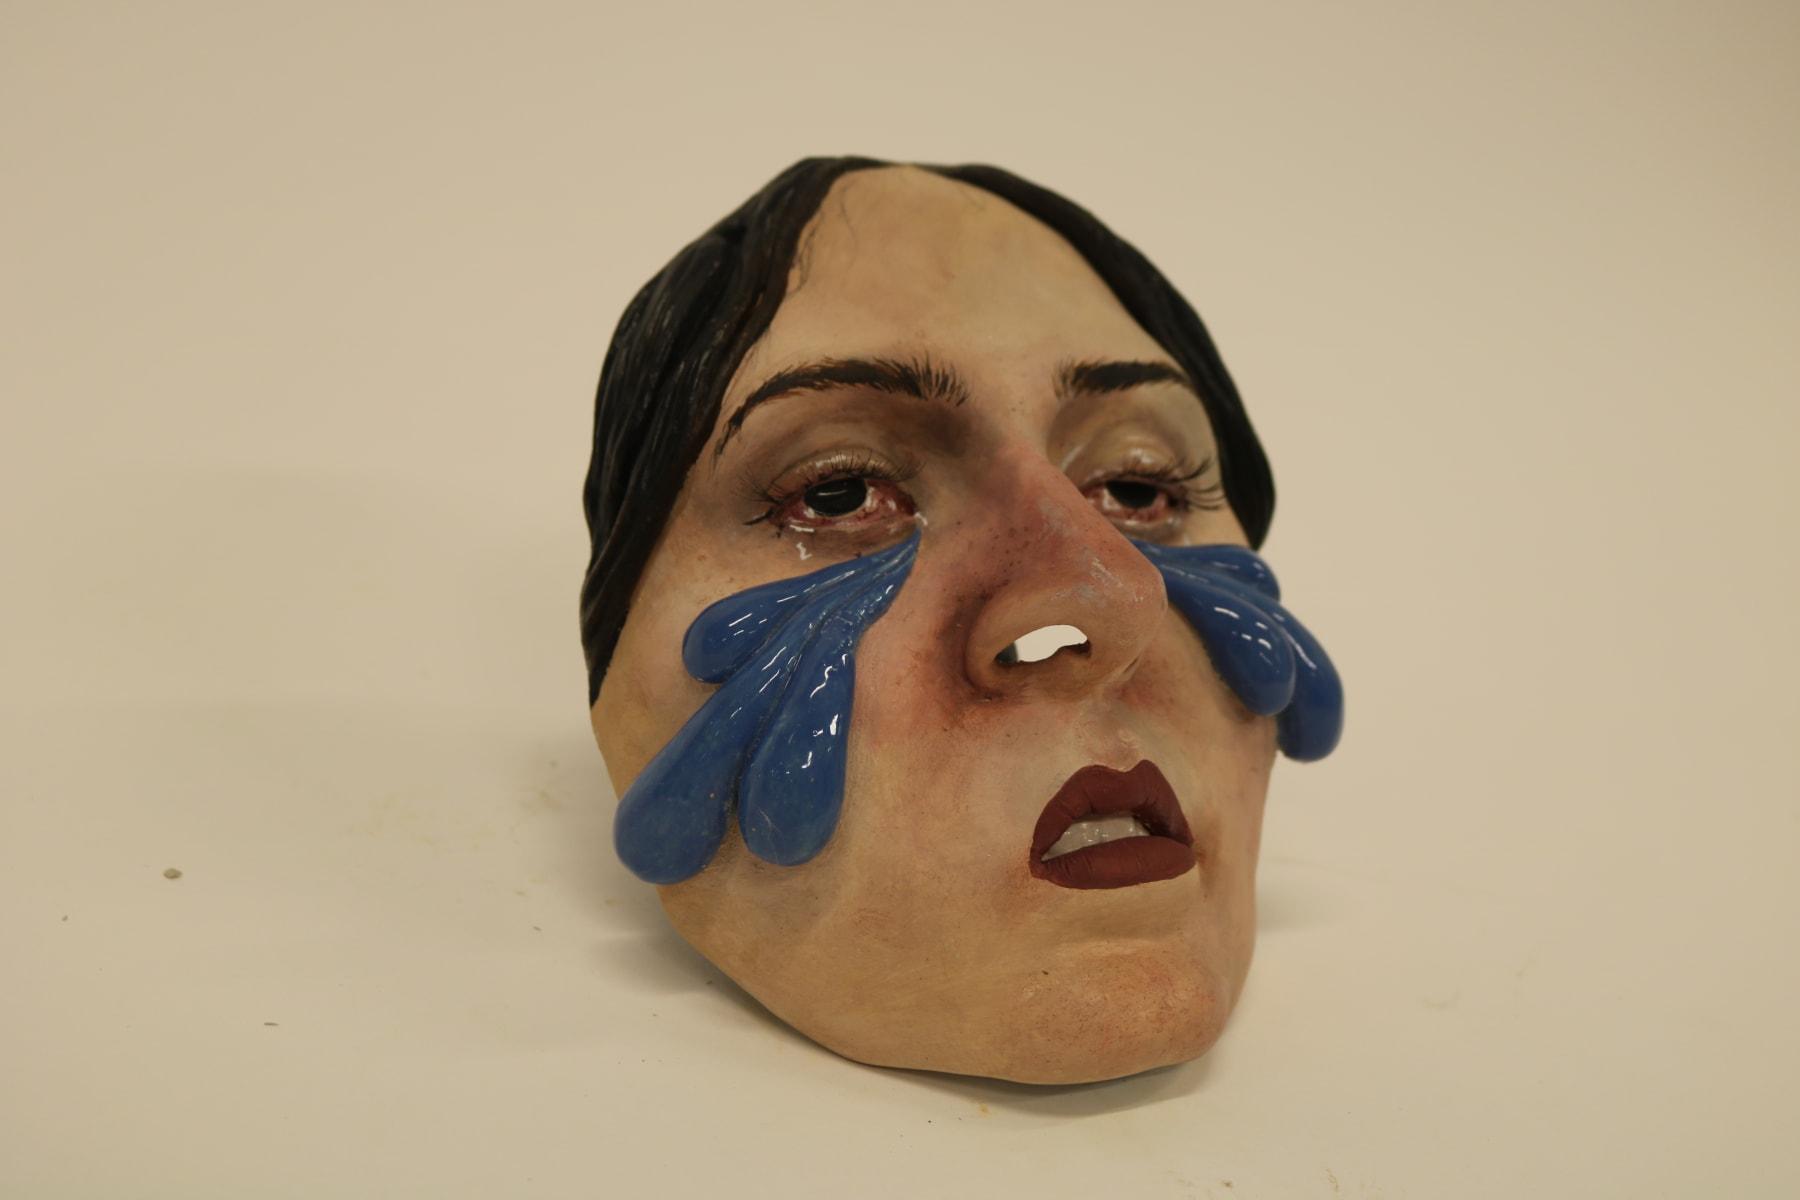 Paola Quiñonez, La Llorona, 2021